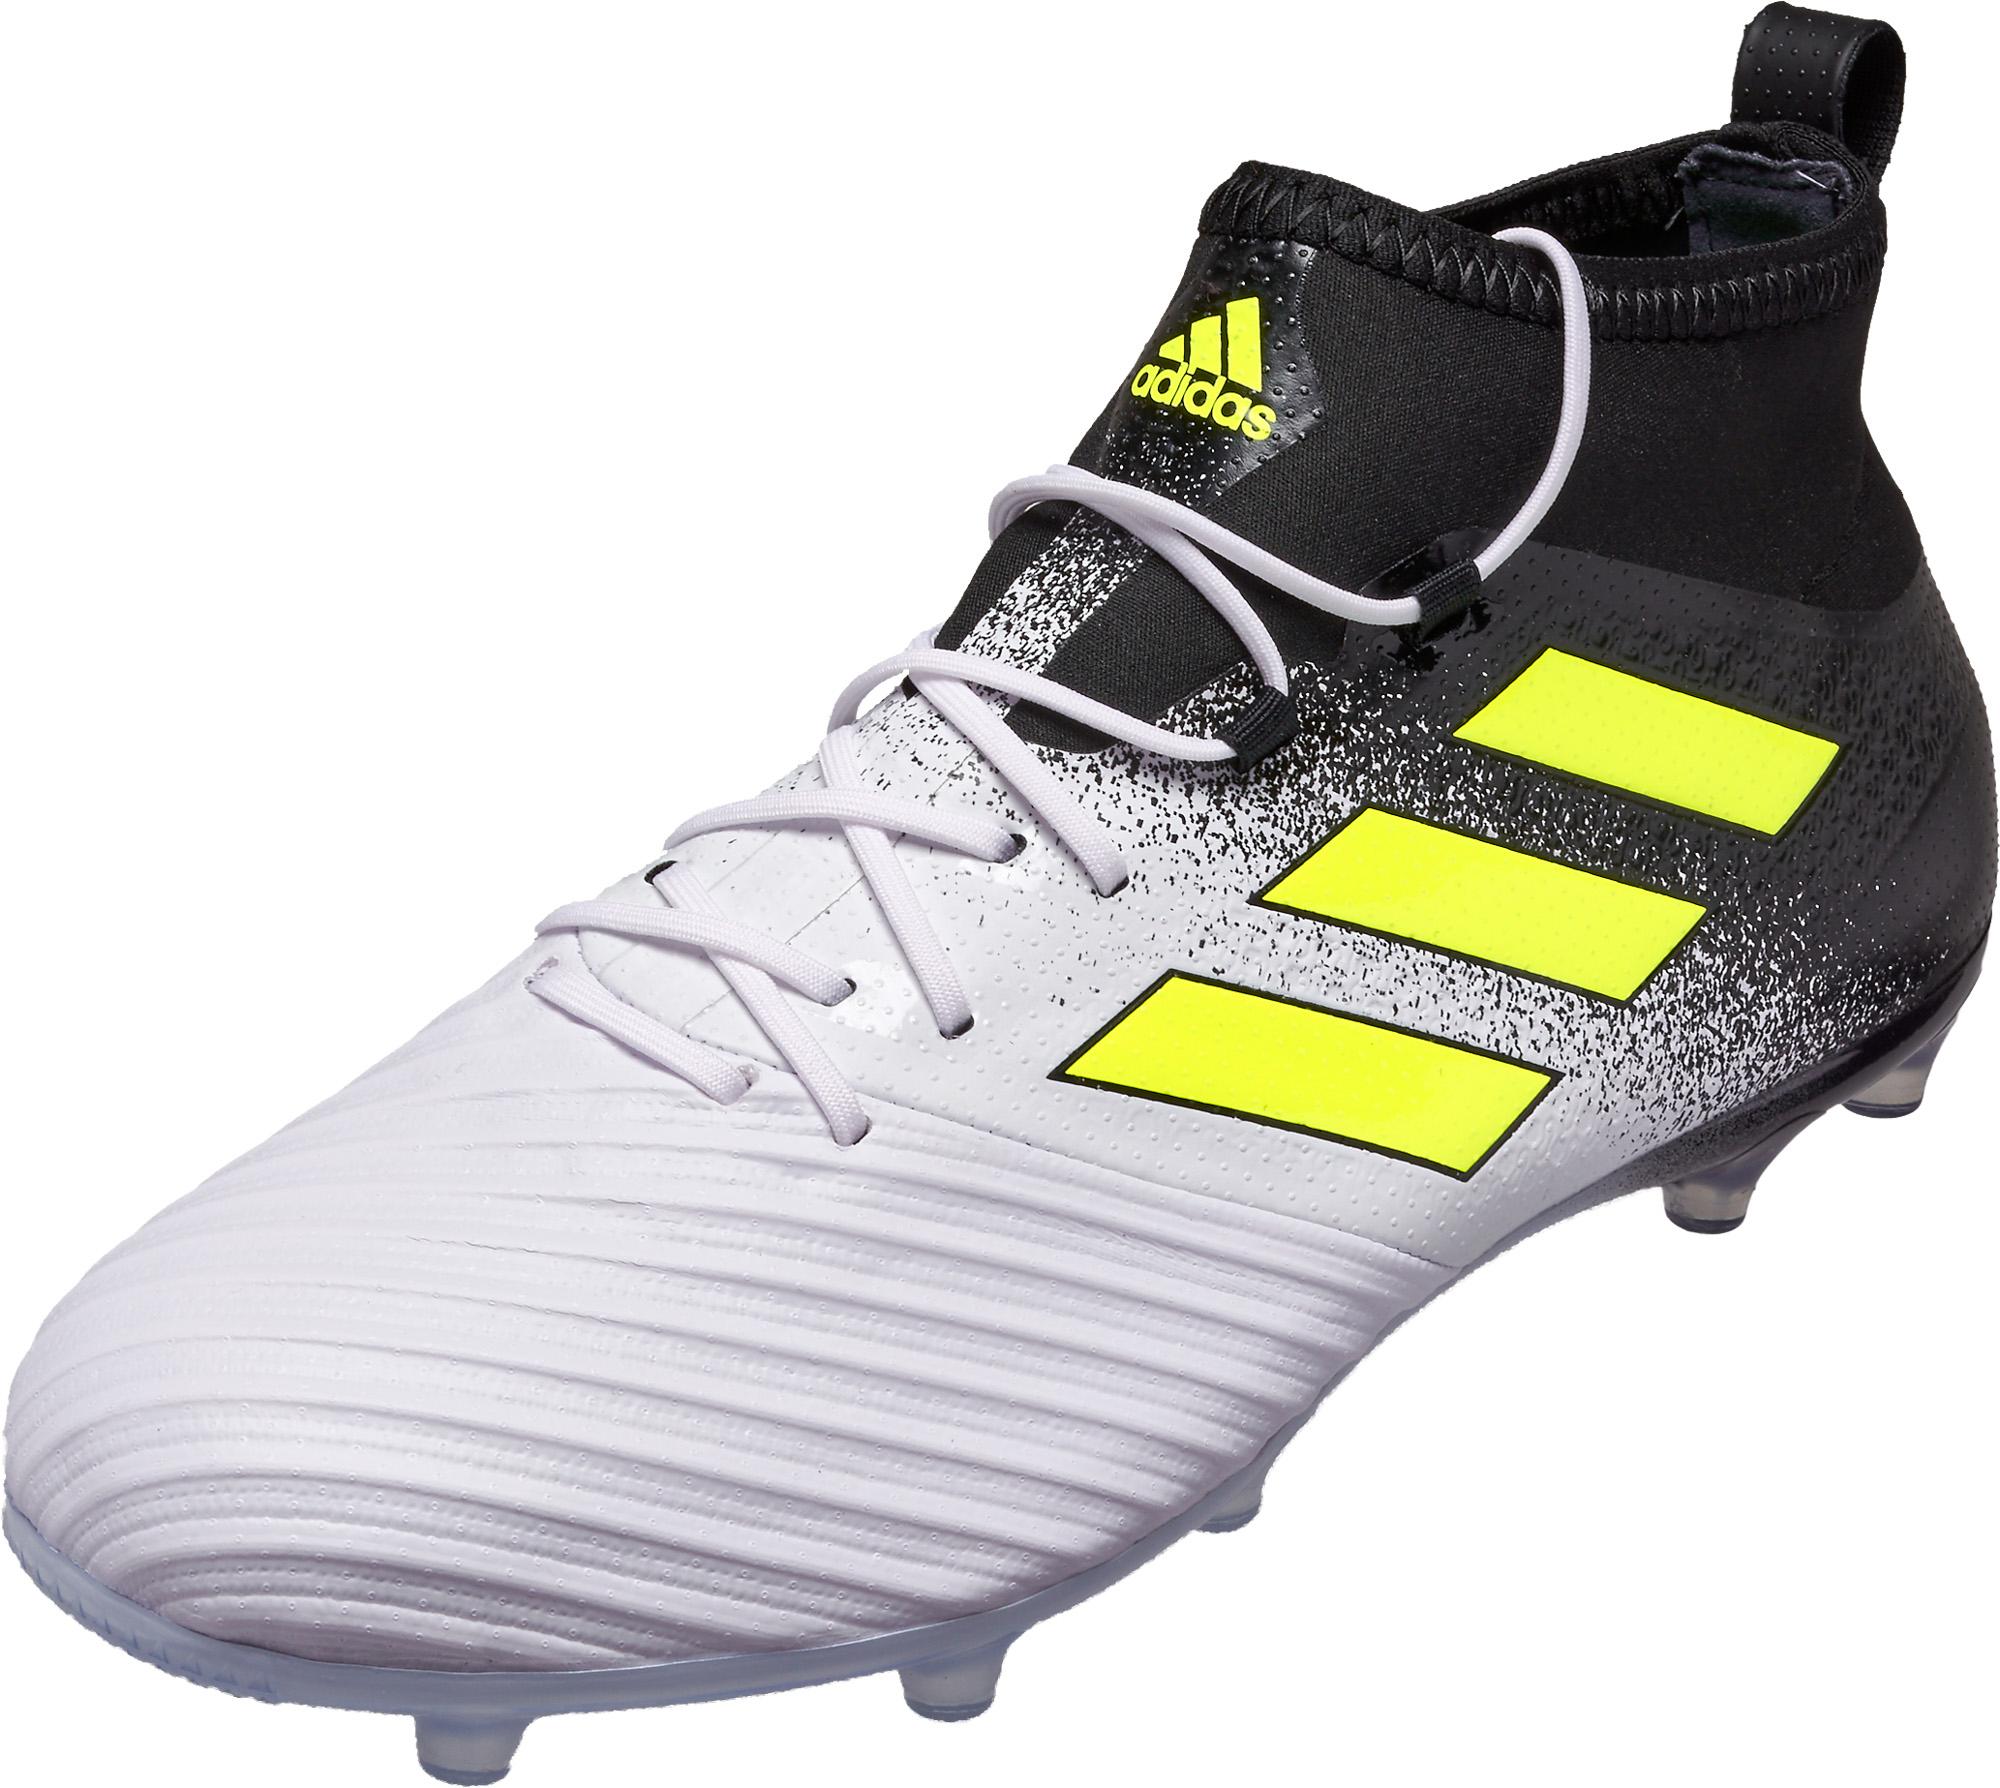 9efbf036da12 adidas ACE 17.2 FG Soccer Cleats - White   Solar Yellow - Soccer ...